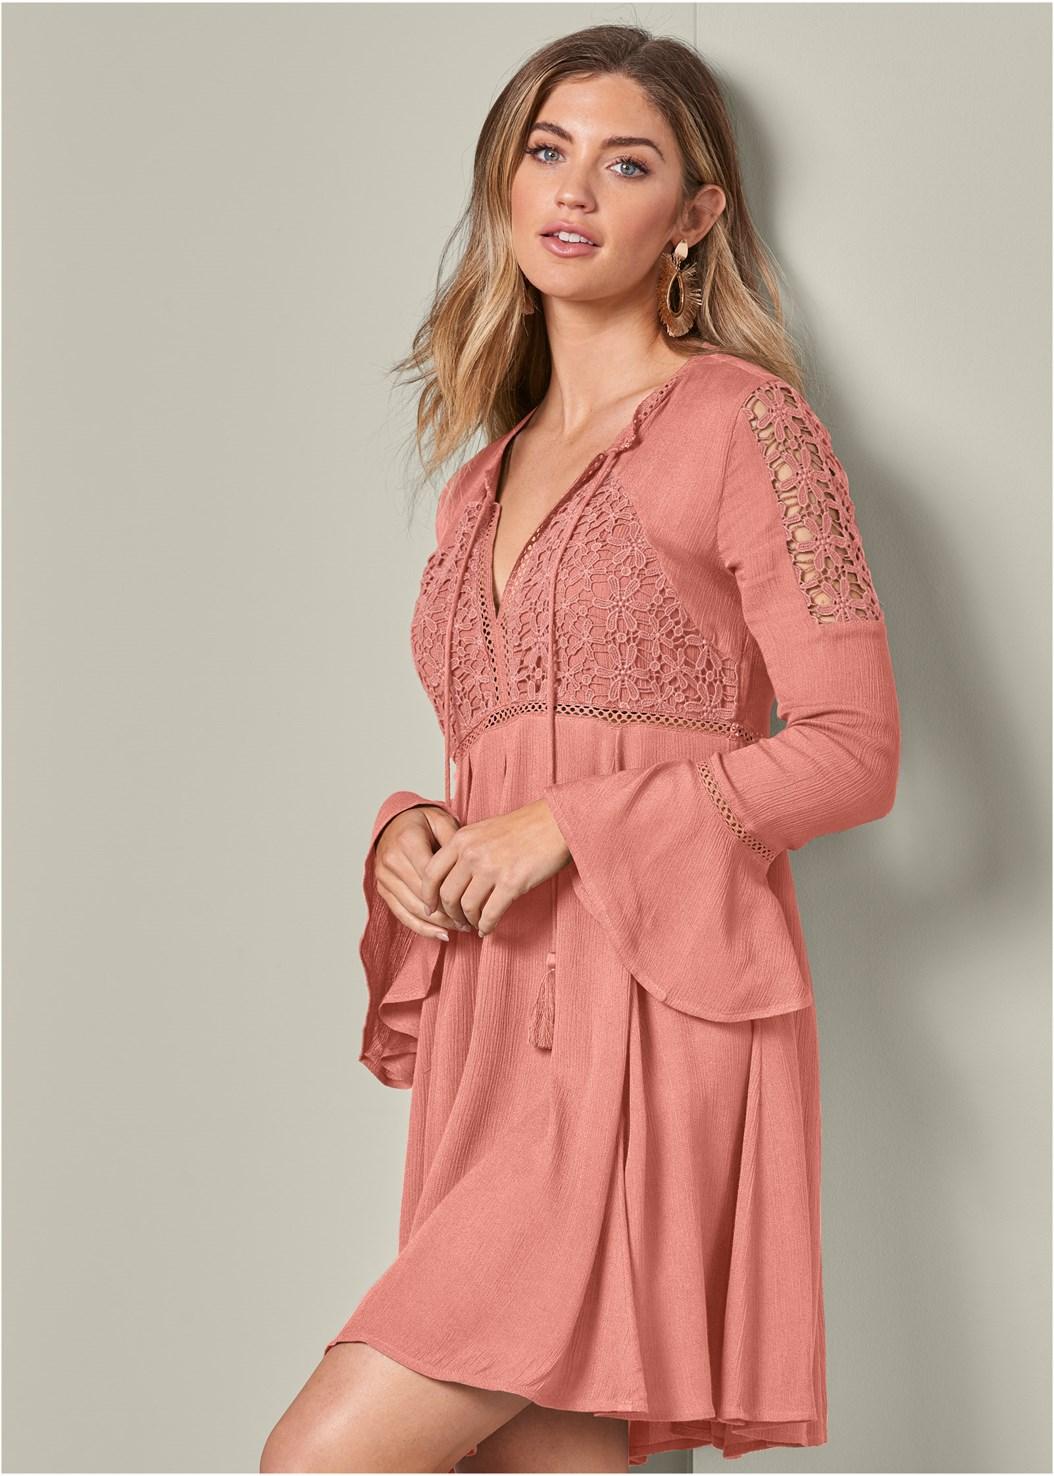 Lace Detail Dress,Naked T-Shirt Bra,Mixed Earring Set